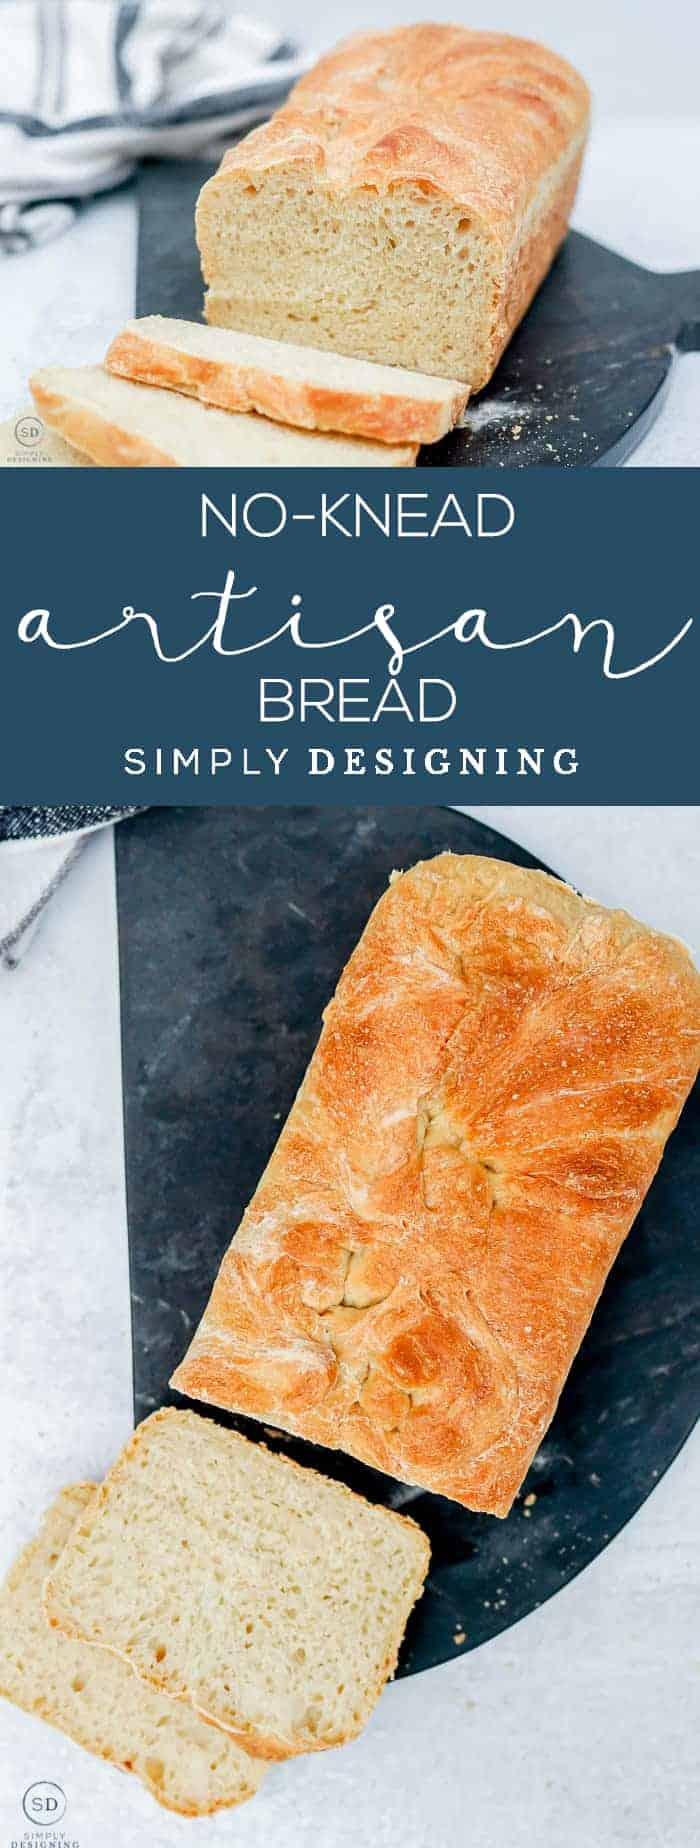 No-Knead Artisan Bread Recipe